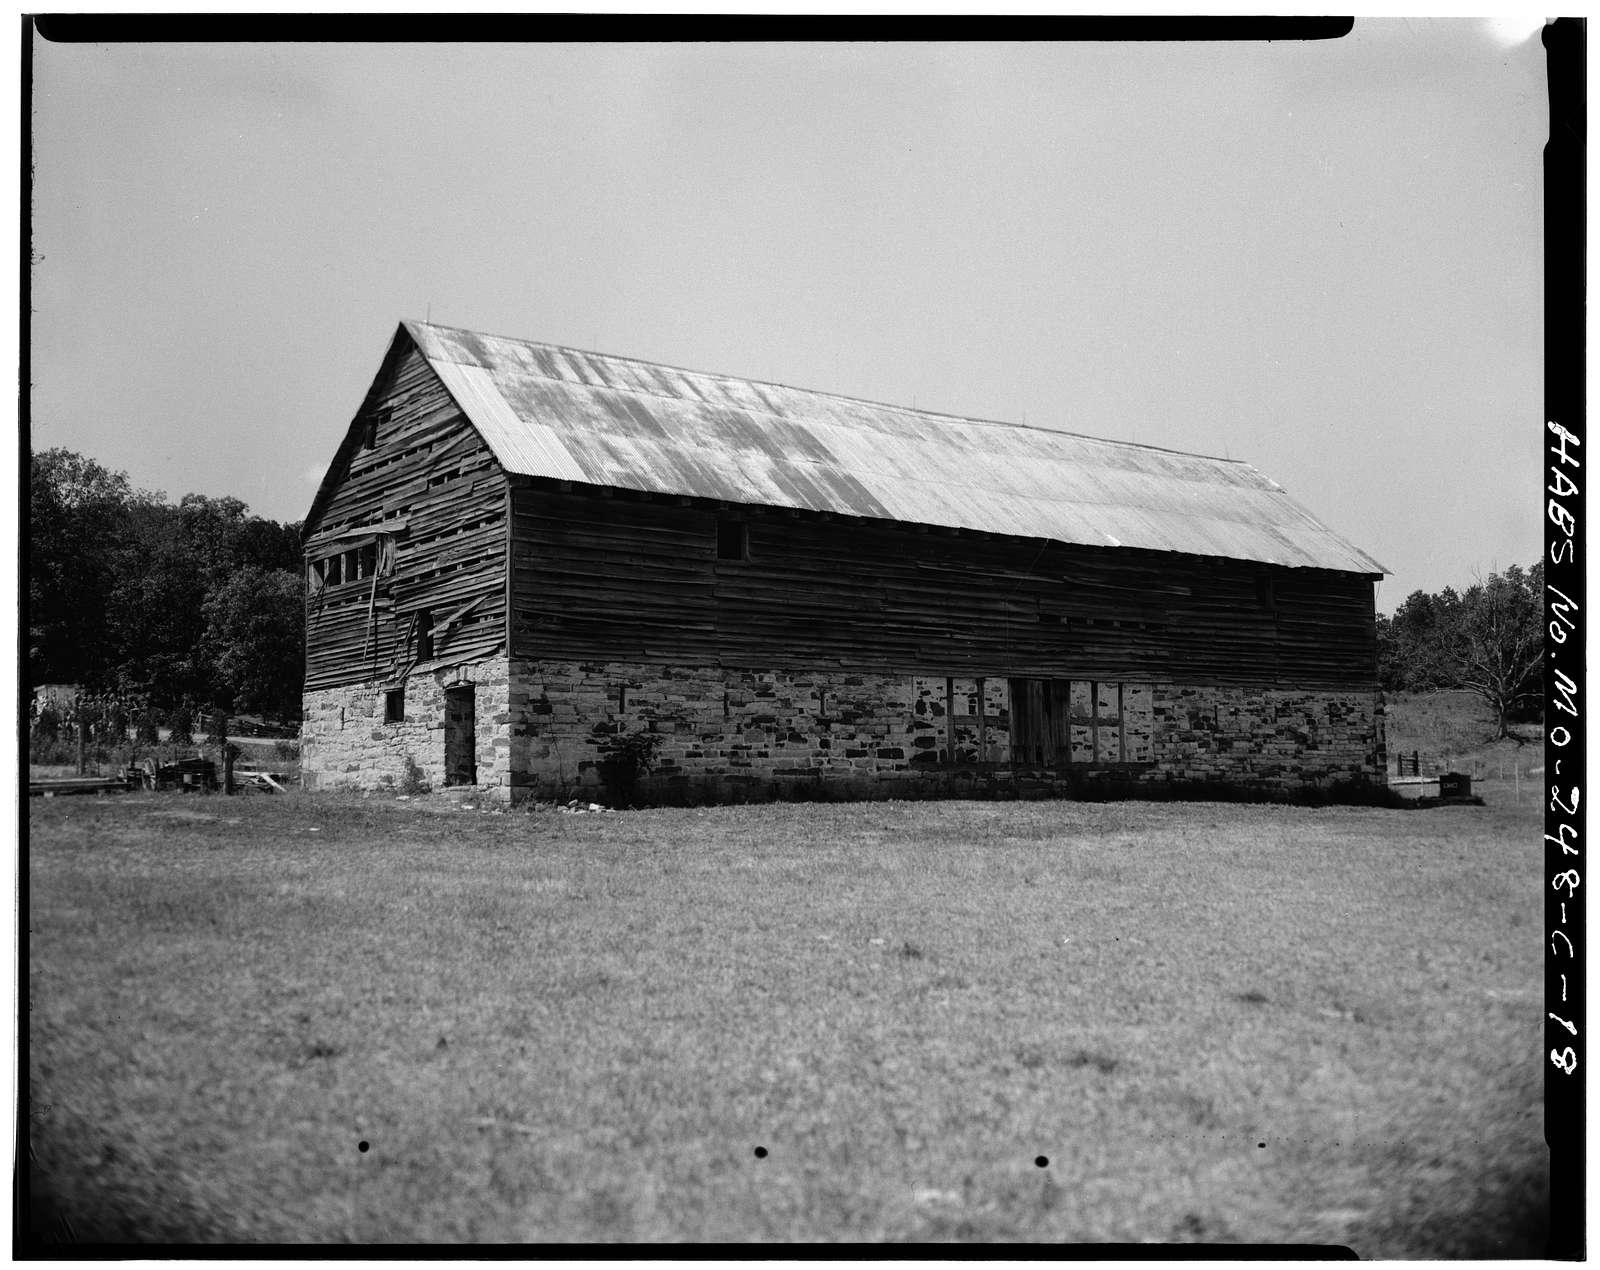 Kotthoff-Weeks Farm, Barn, County Route J vicinity, Gasconade, Gasconade County, MO